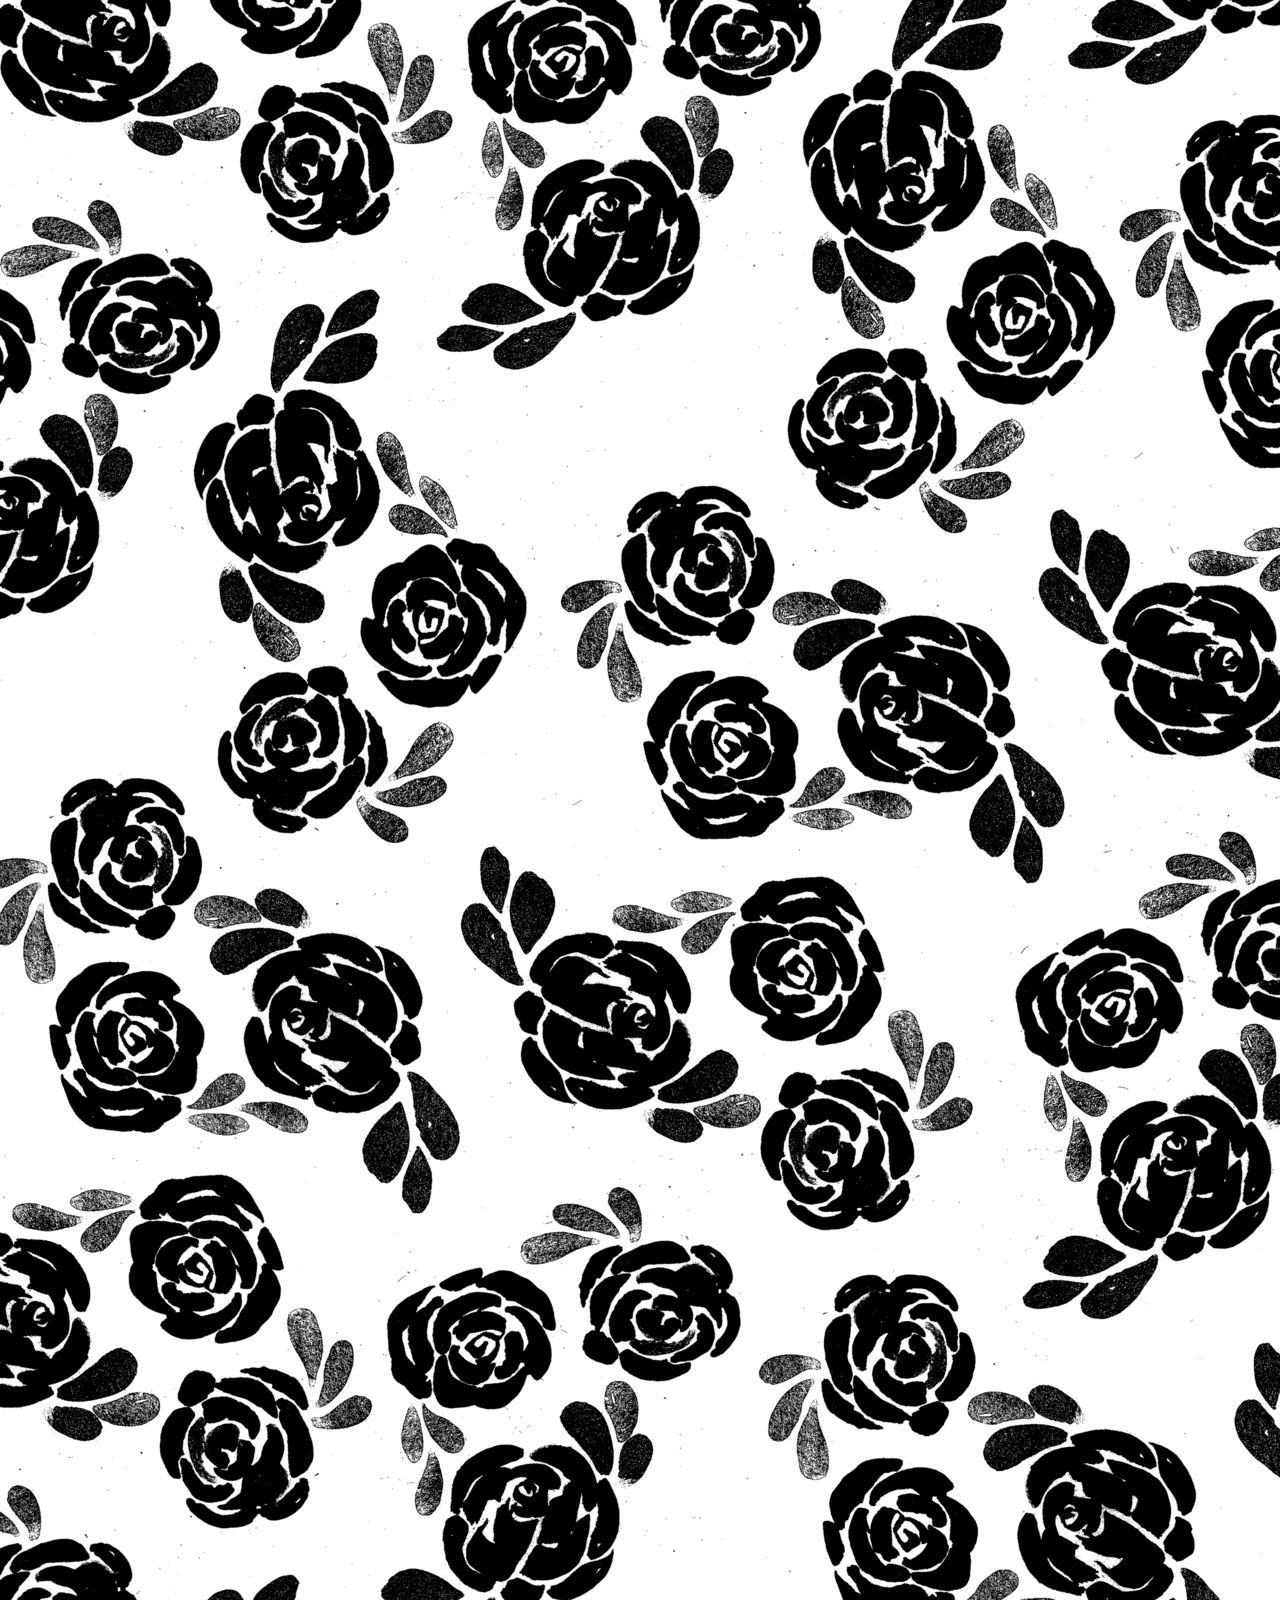 Papier Fabrik Black And White Roses Patterns Pinterest